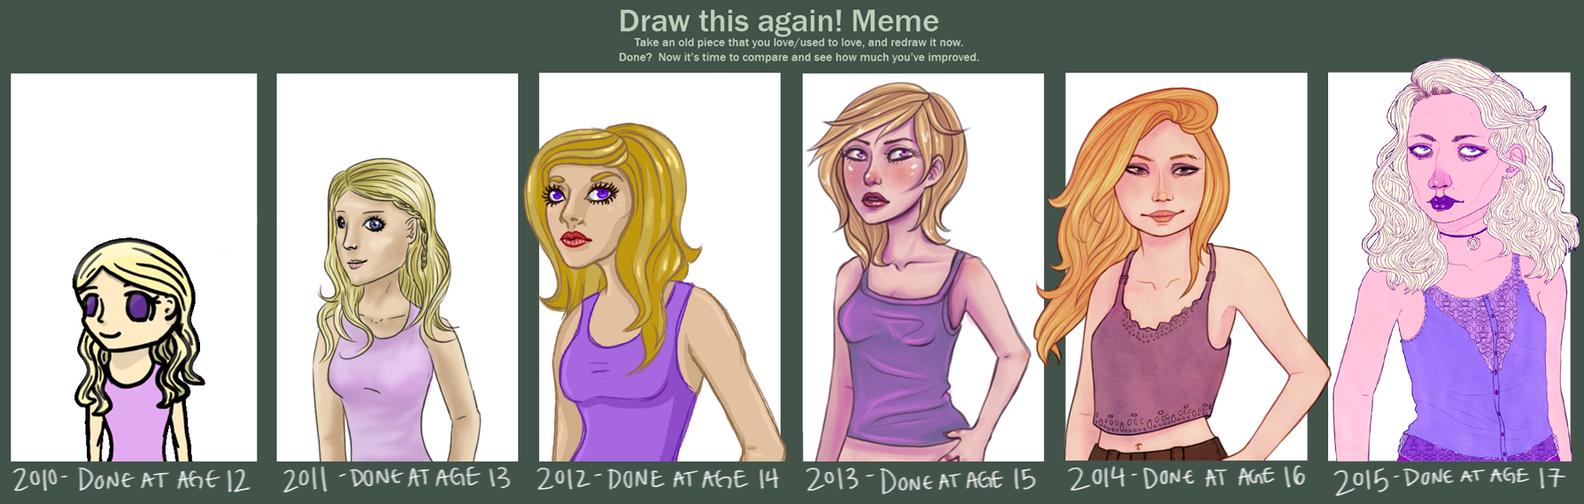 Draw This Again Again Again Again Again by wick-y